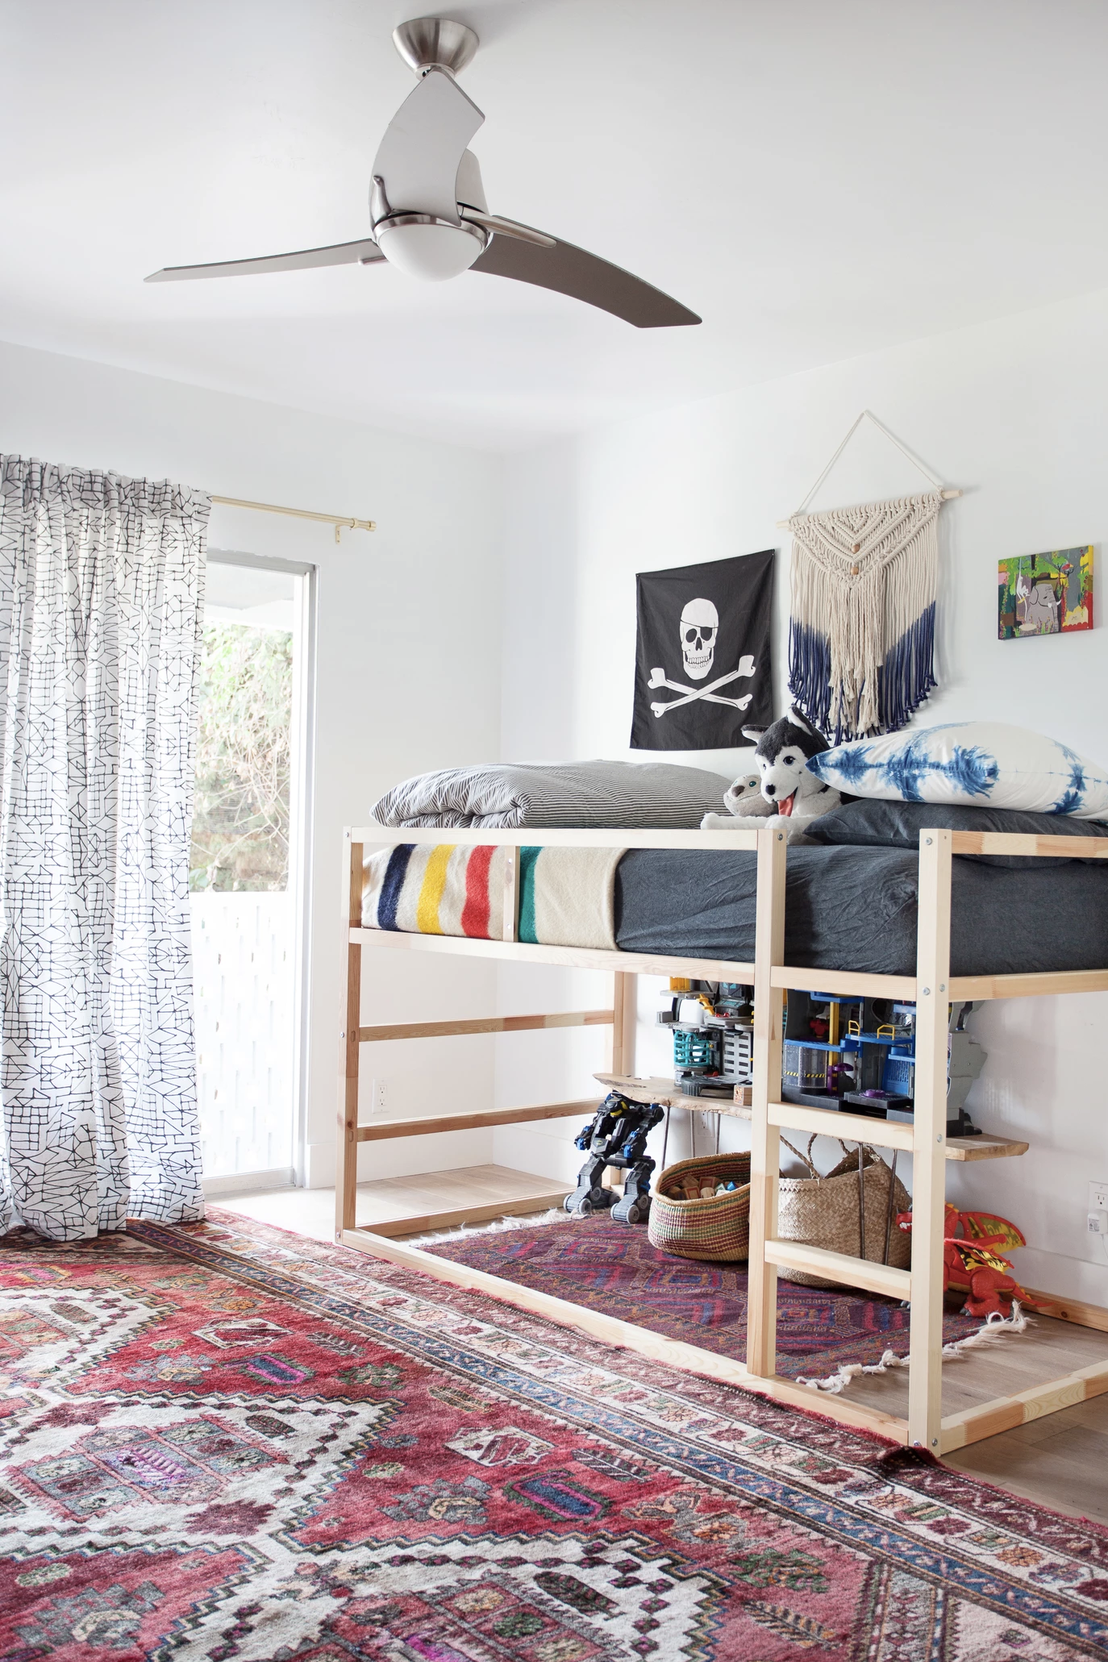 Easy And Clever Kid S Room Storage Ideas Storage Kids Room Kid